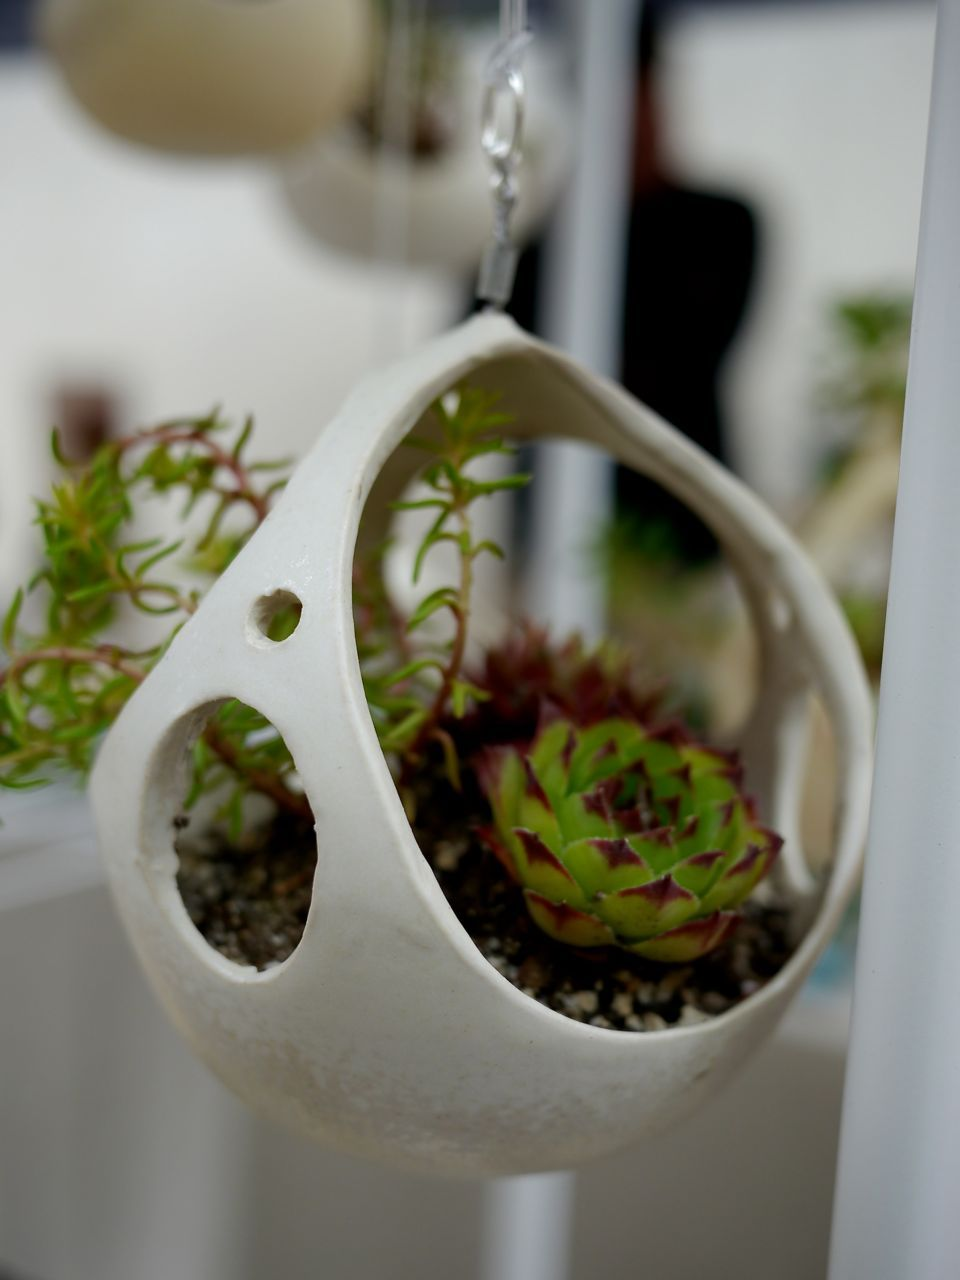 Hanging ceramic planter with succulents, by Kamspots - Hanging Ceramic Planter With Succulents, By Kamspots Ceramics